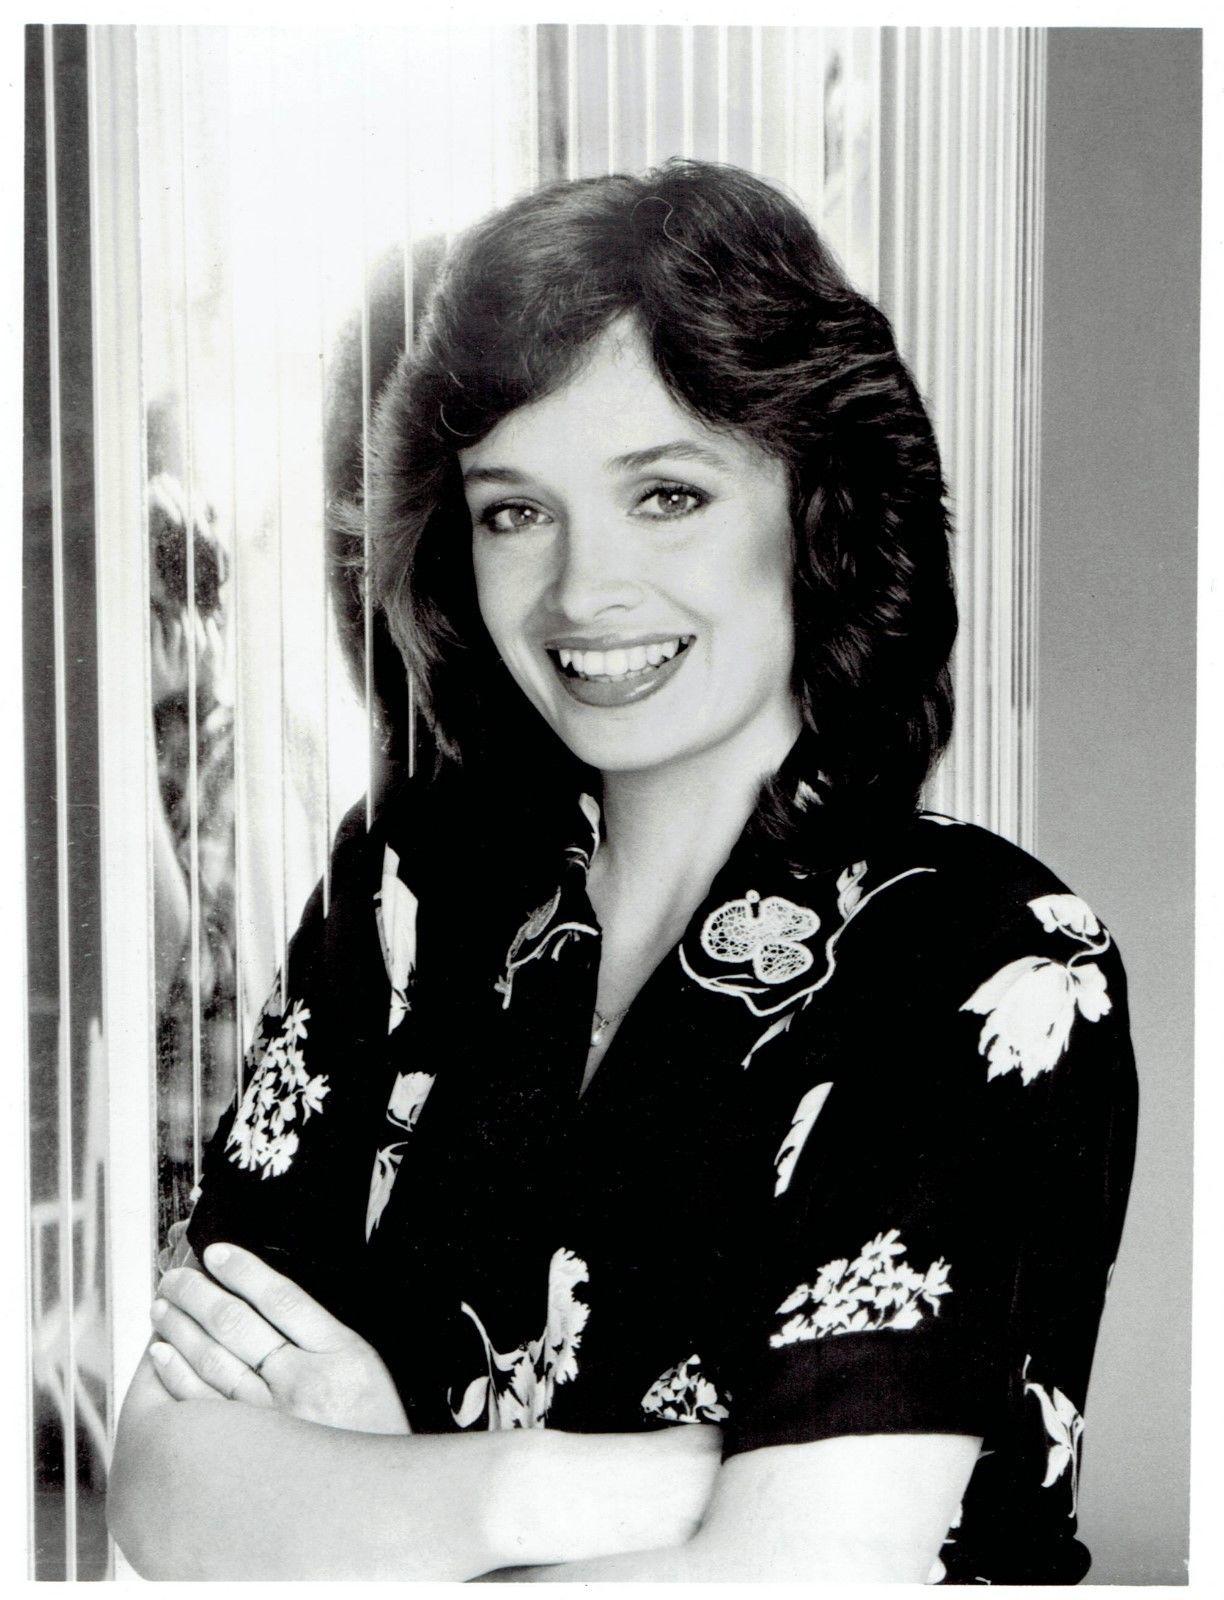 1982_Original_ABC_Photo_Deborah_Van_Valkenburgh